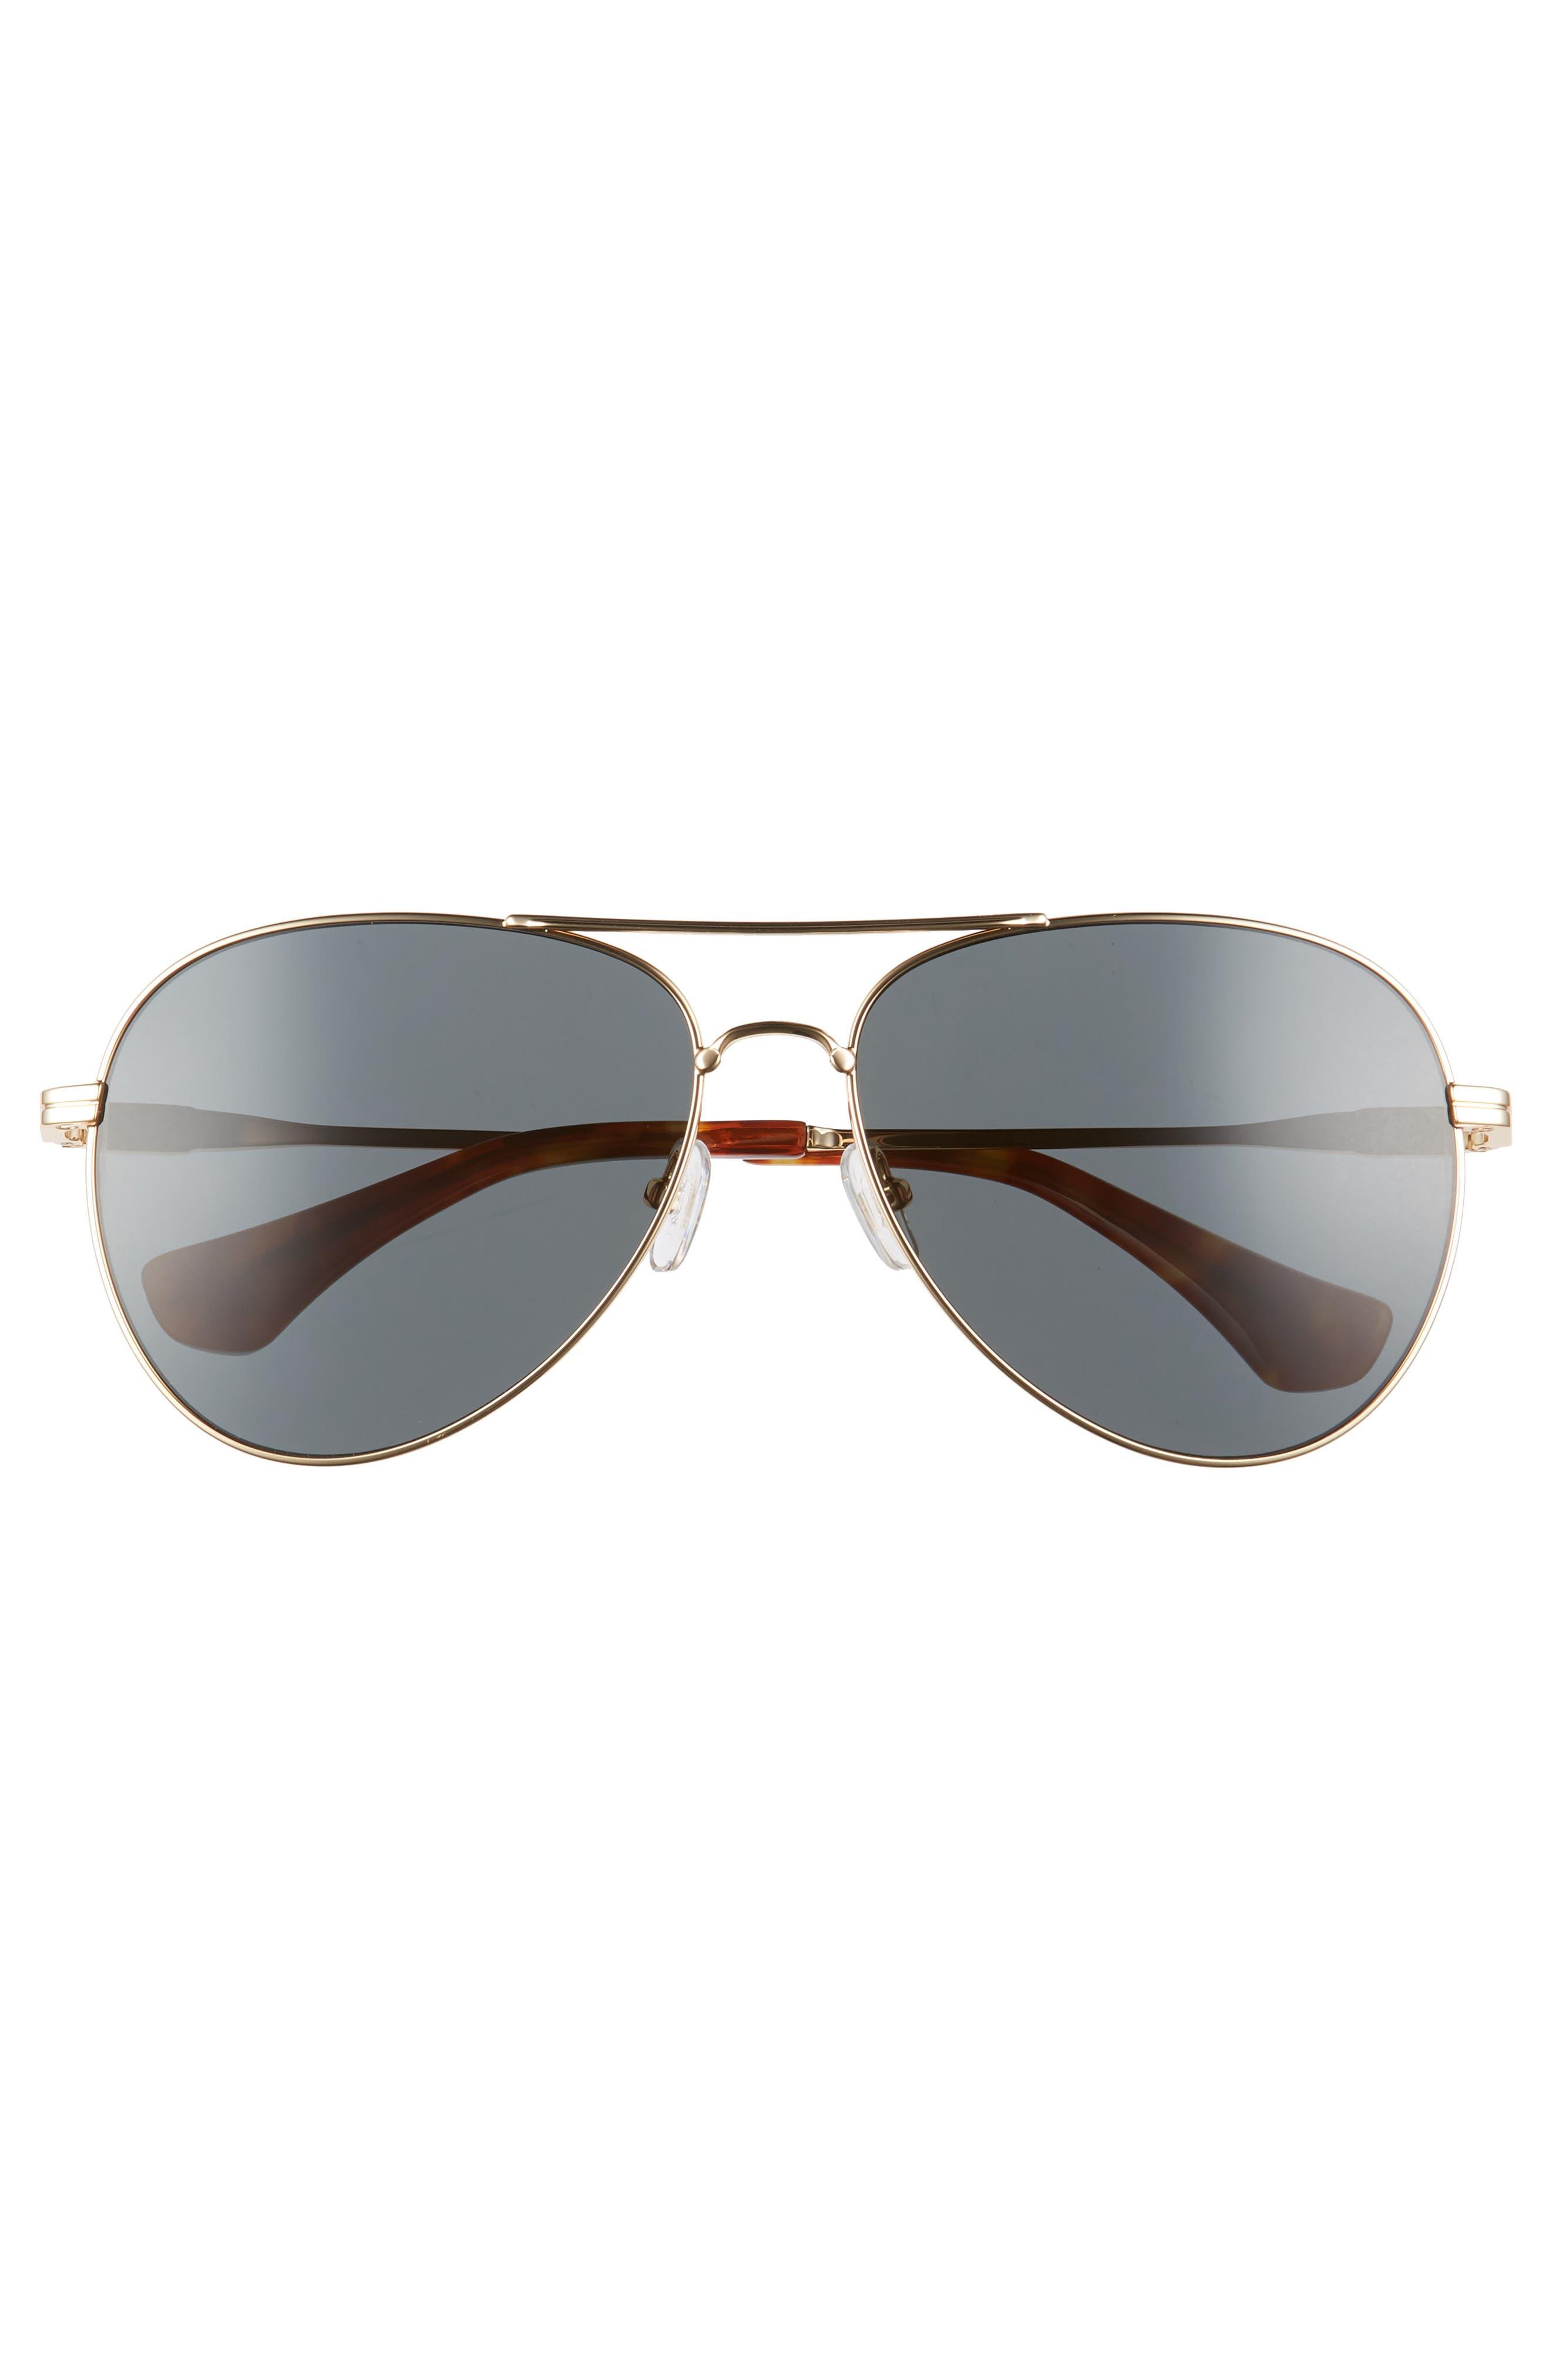 Lodi 61mm Mirrored Aviator Sunglasses,                             Alternate thumbnail 3, color,                             Gold Wire/ Black Solid